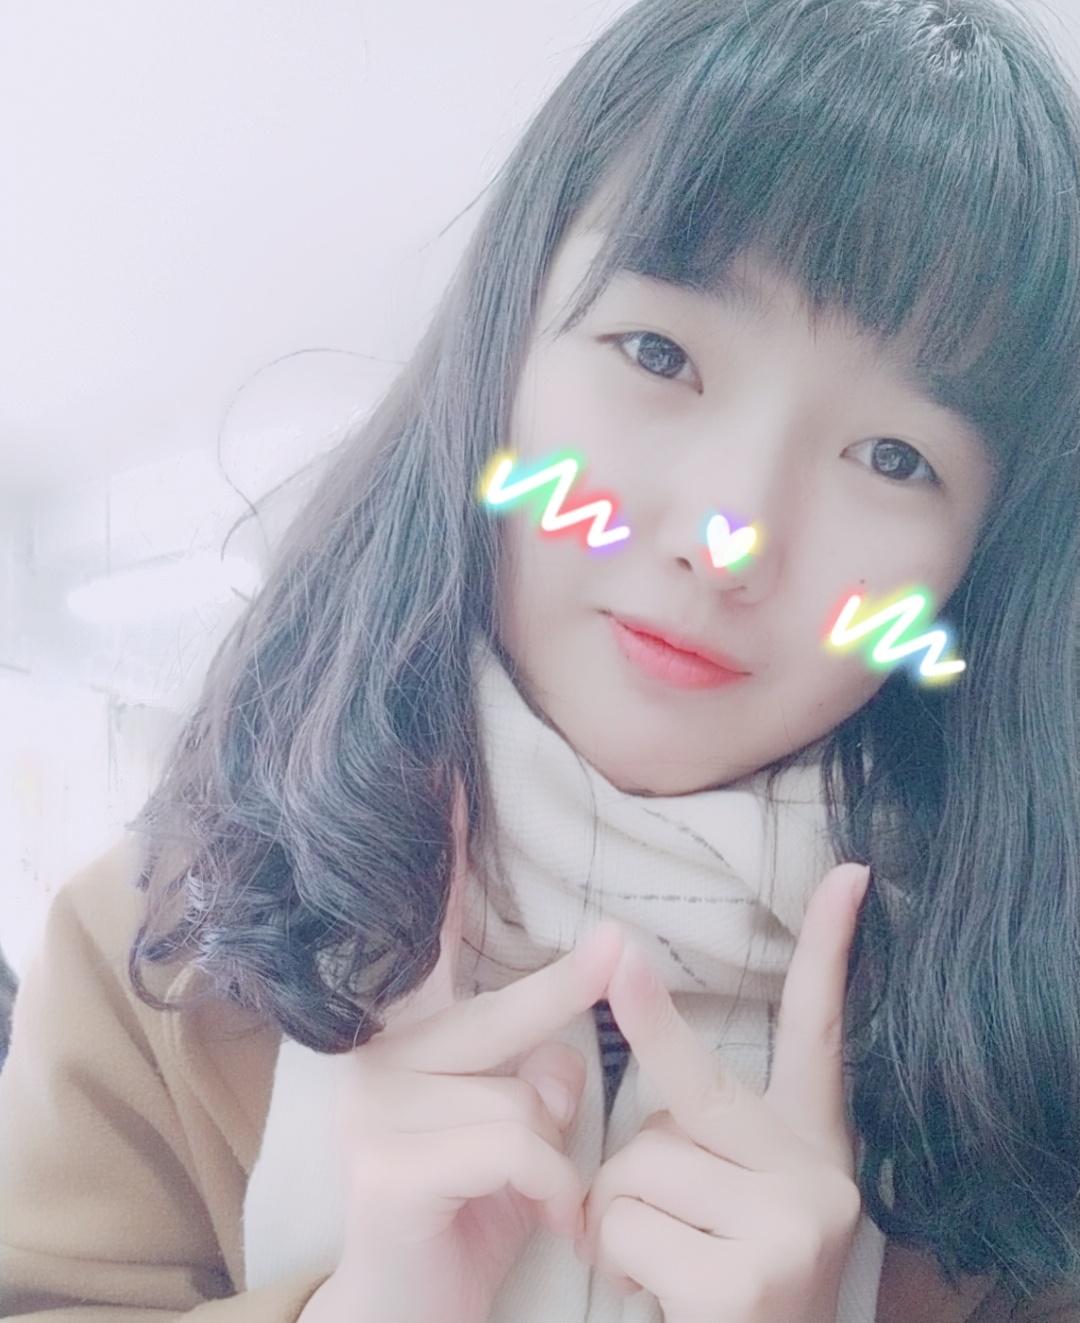 IMG_20171111_224850.JPG